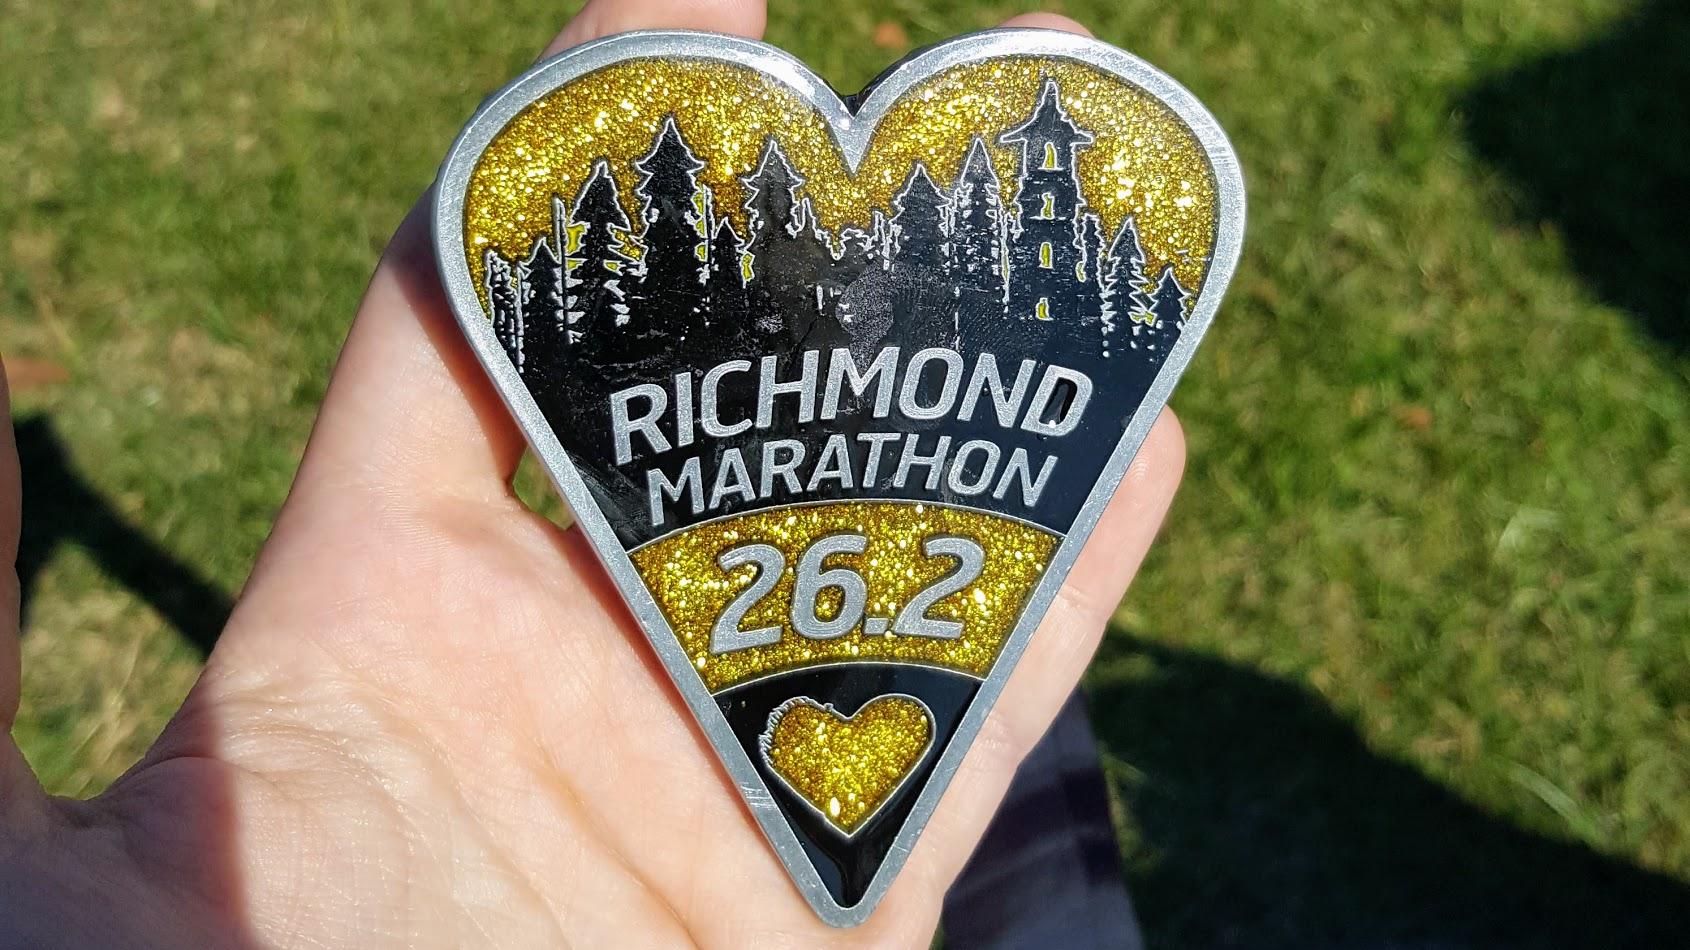 Runfest Richmond Marathon Medal